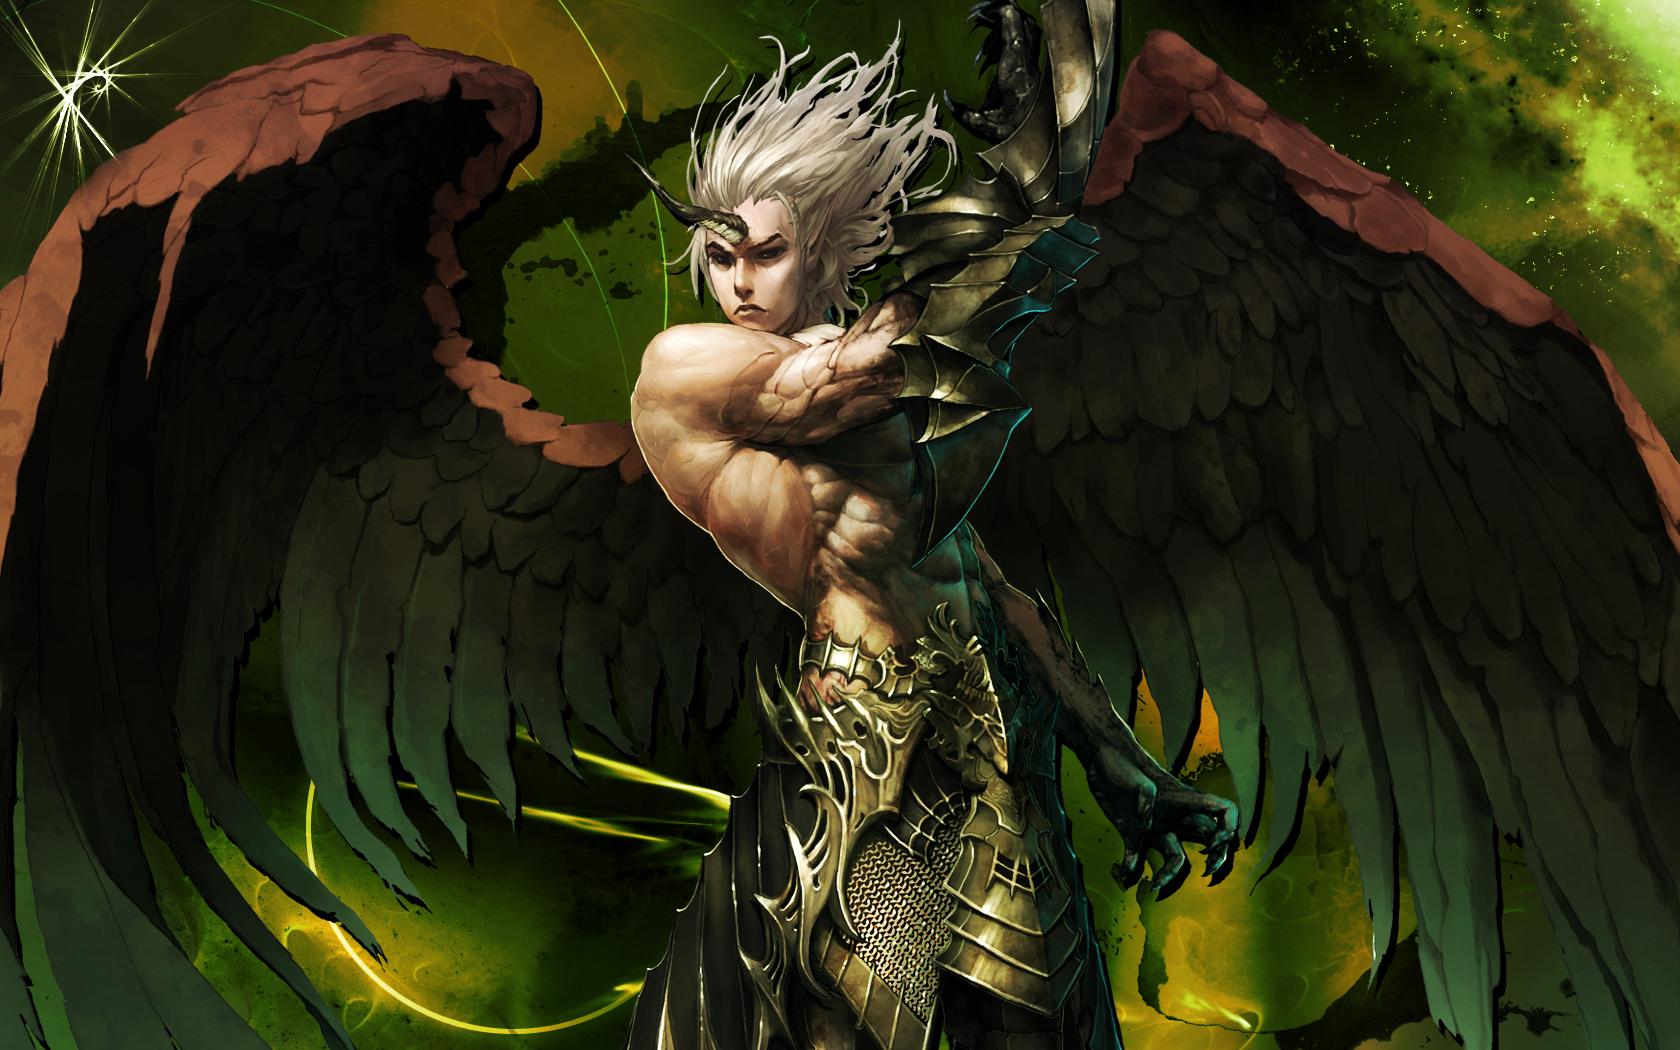 Visengard Race Games_Winged_demon_041192_